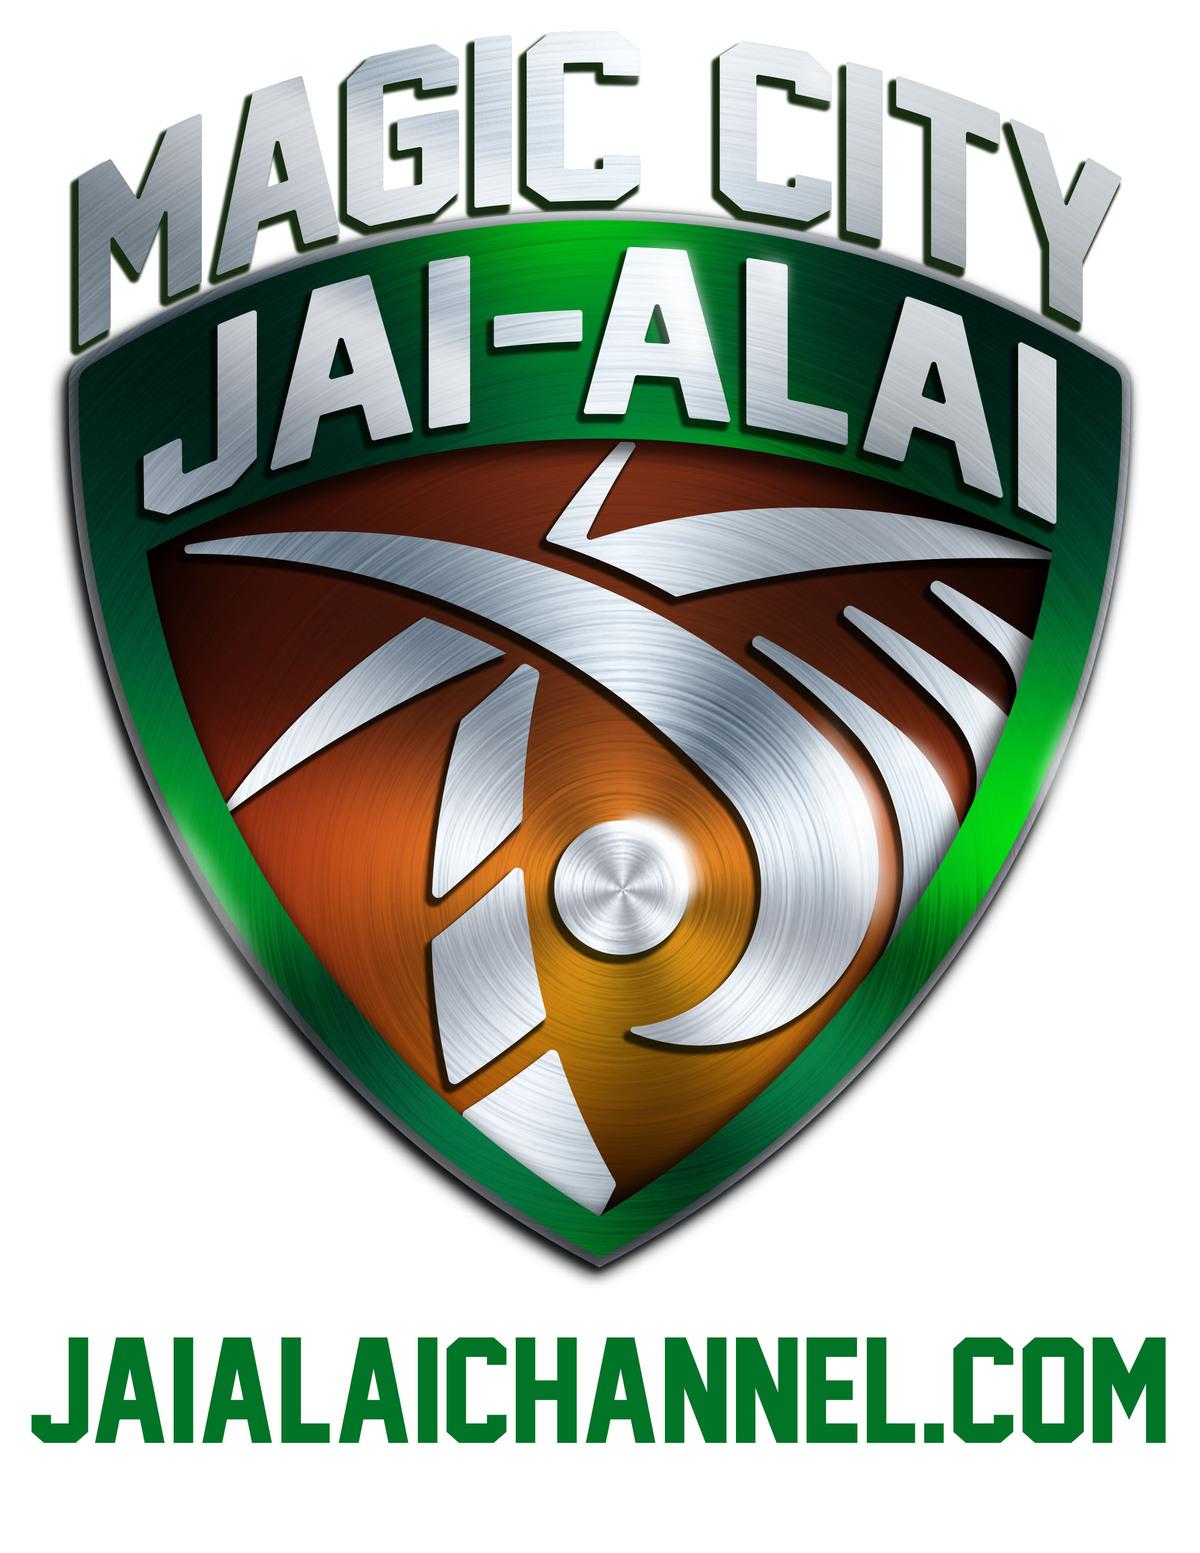 Jai-Alai H2H - Doubles H2H - Sat. Jul 17, 2021